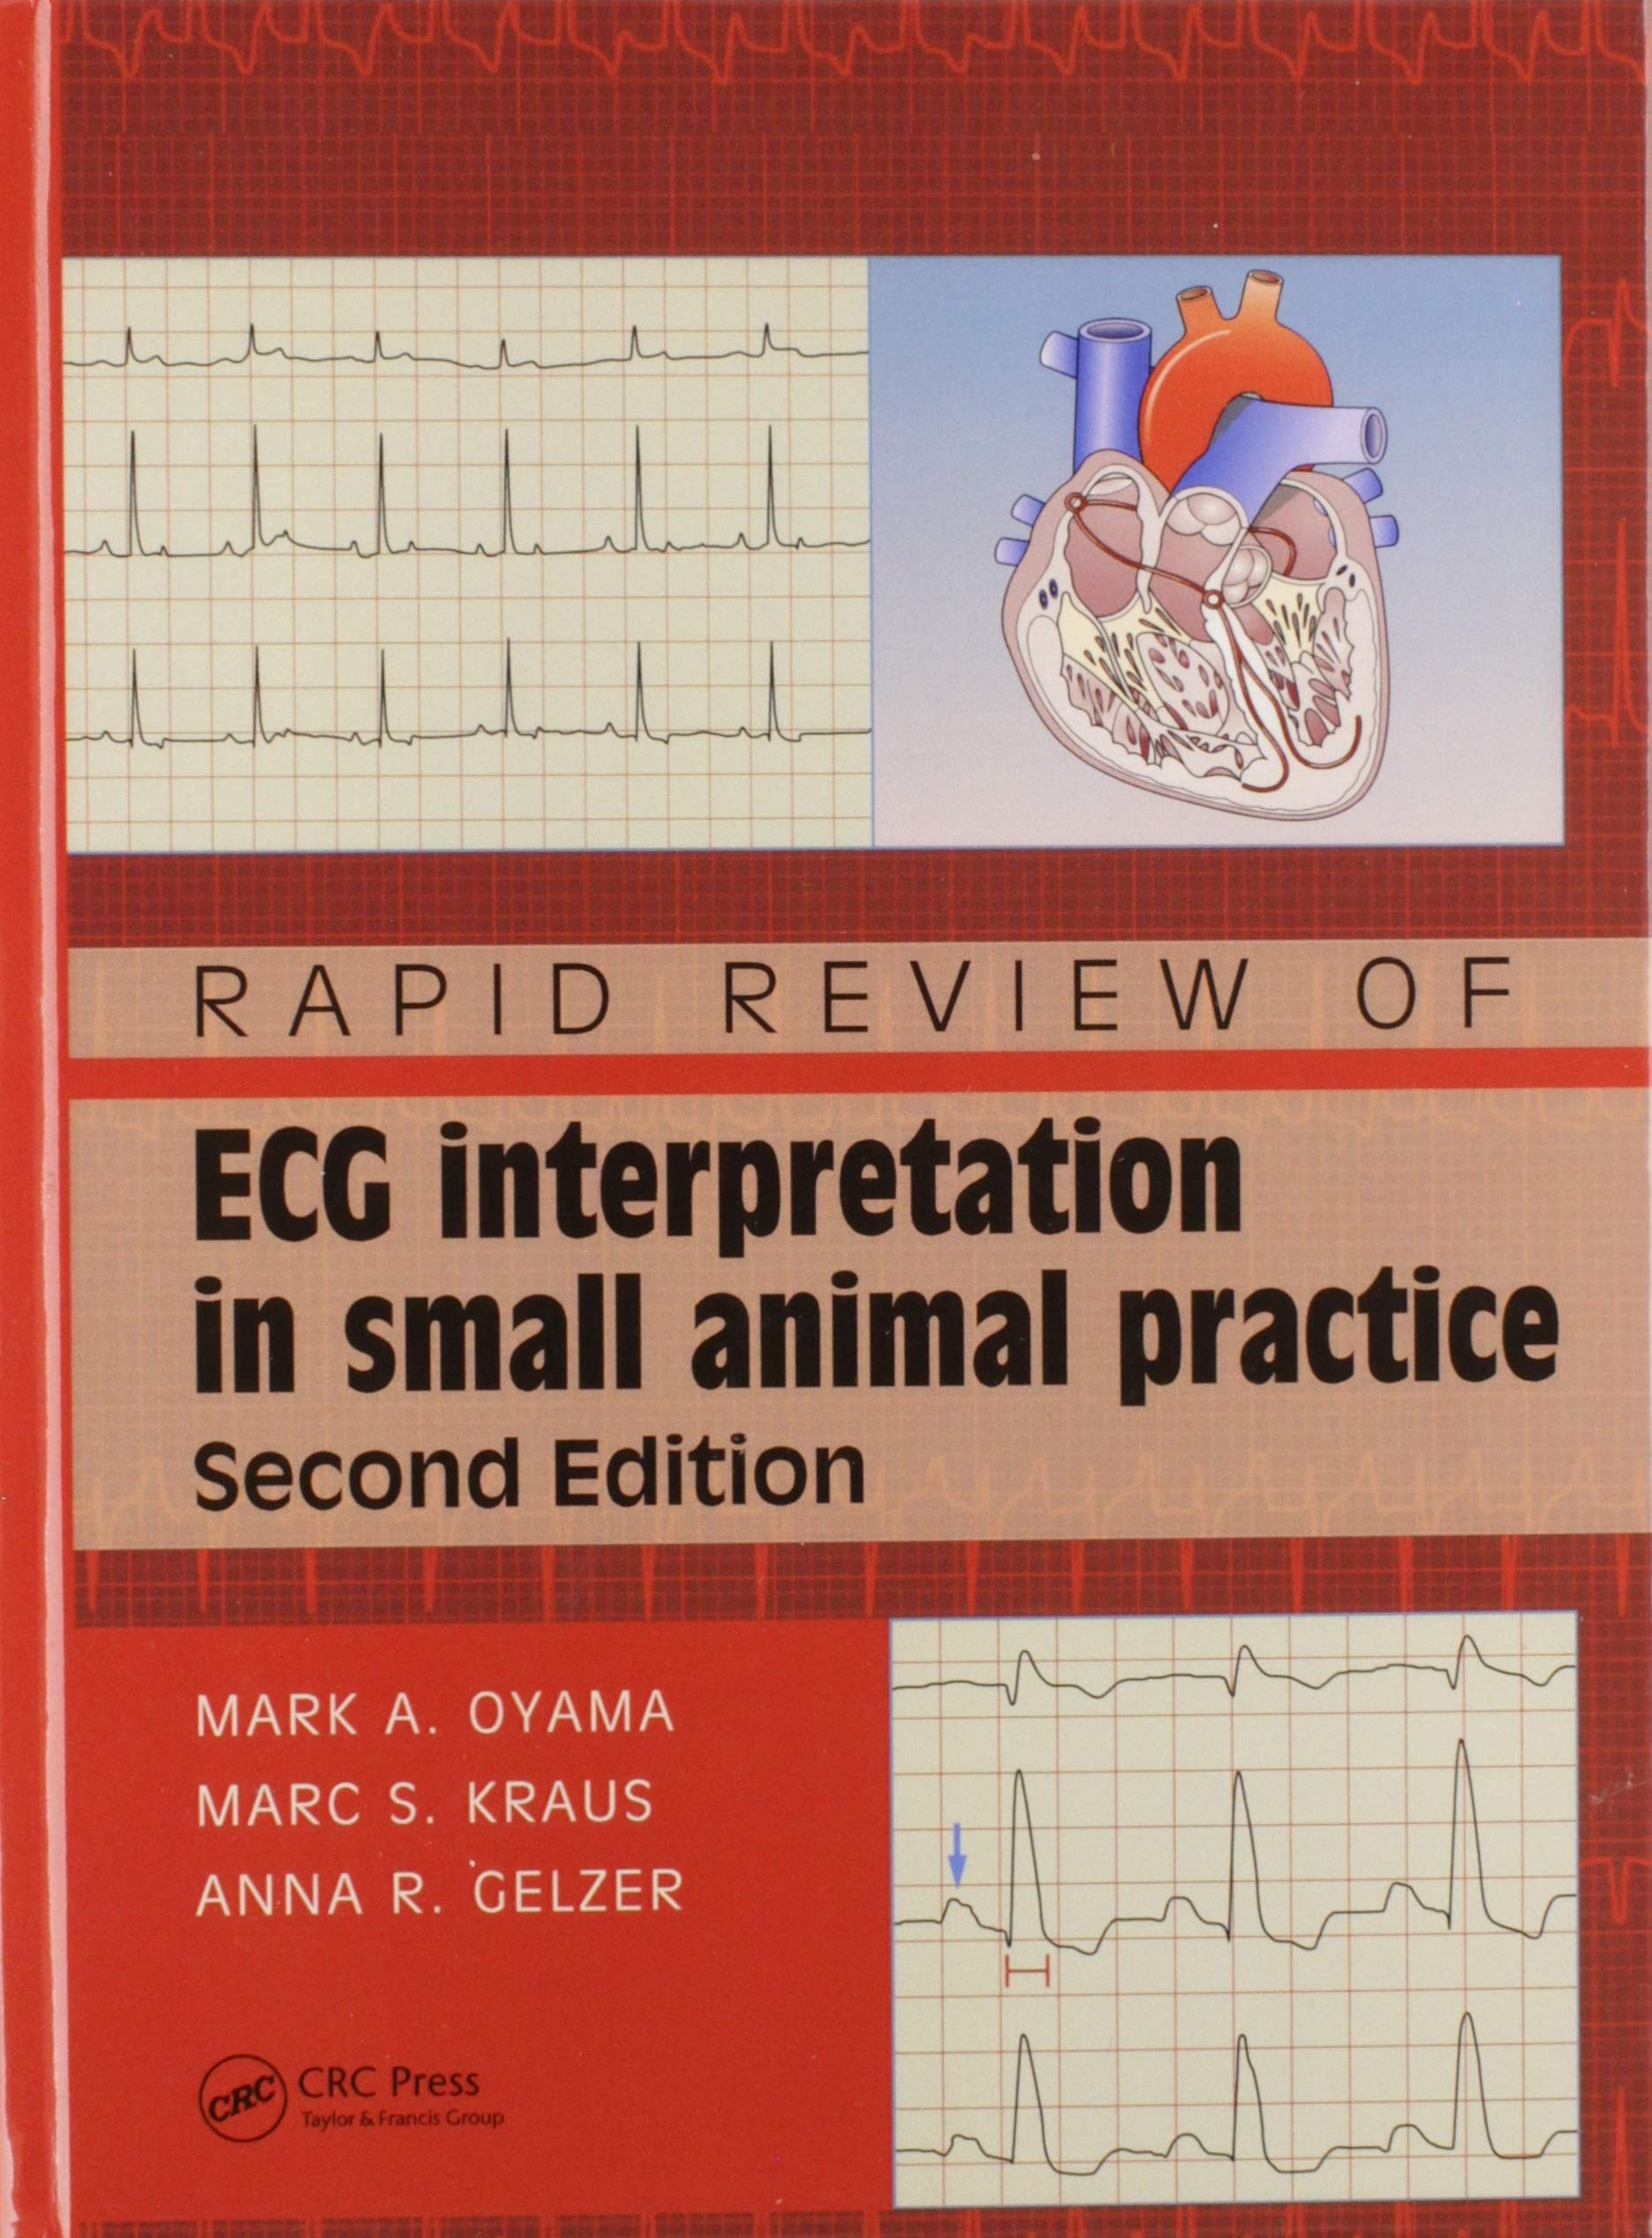 Rapid Review of ECG Interpretation in Small Animal